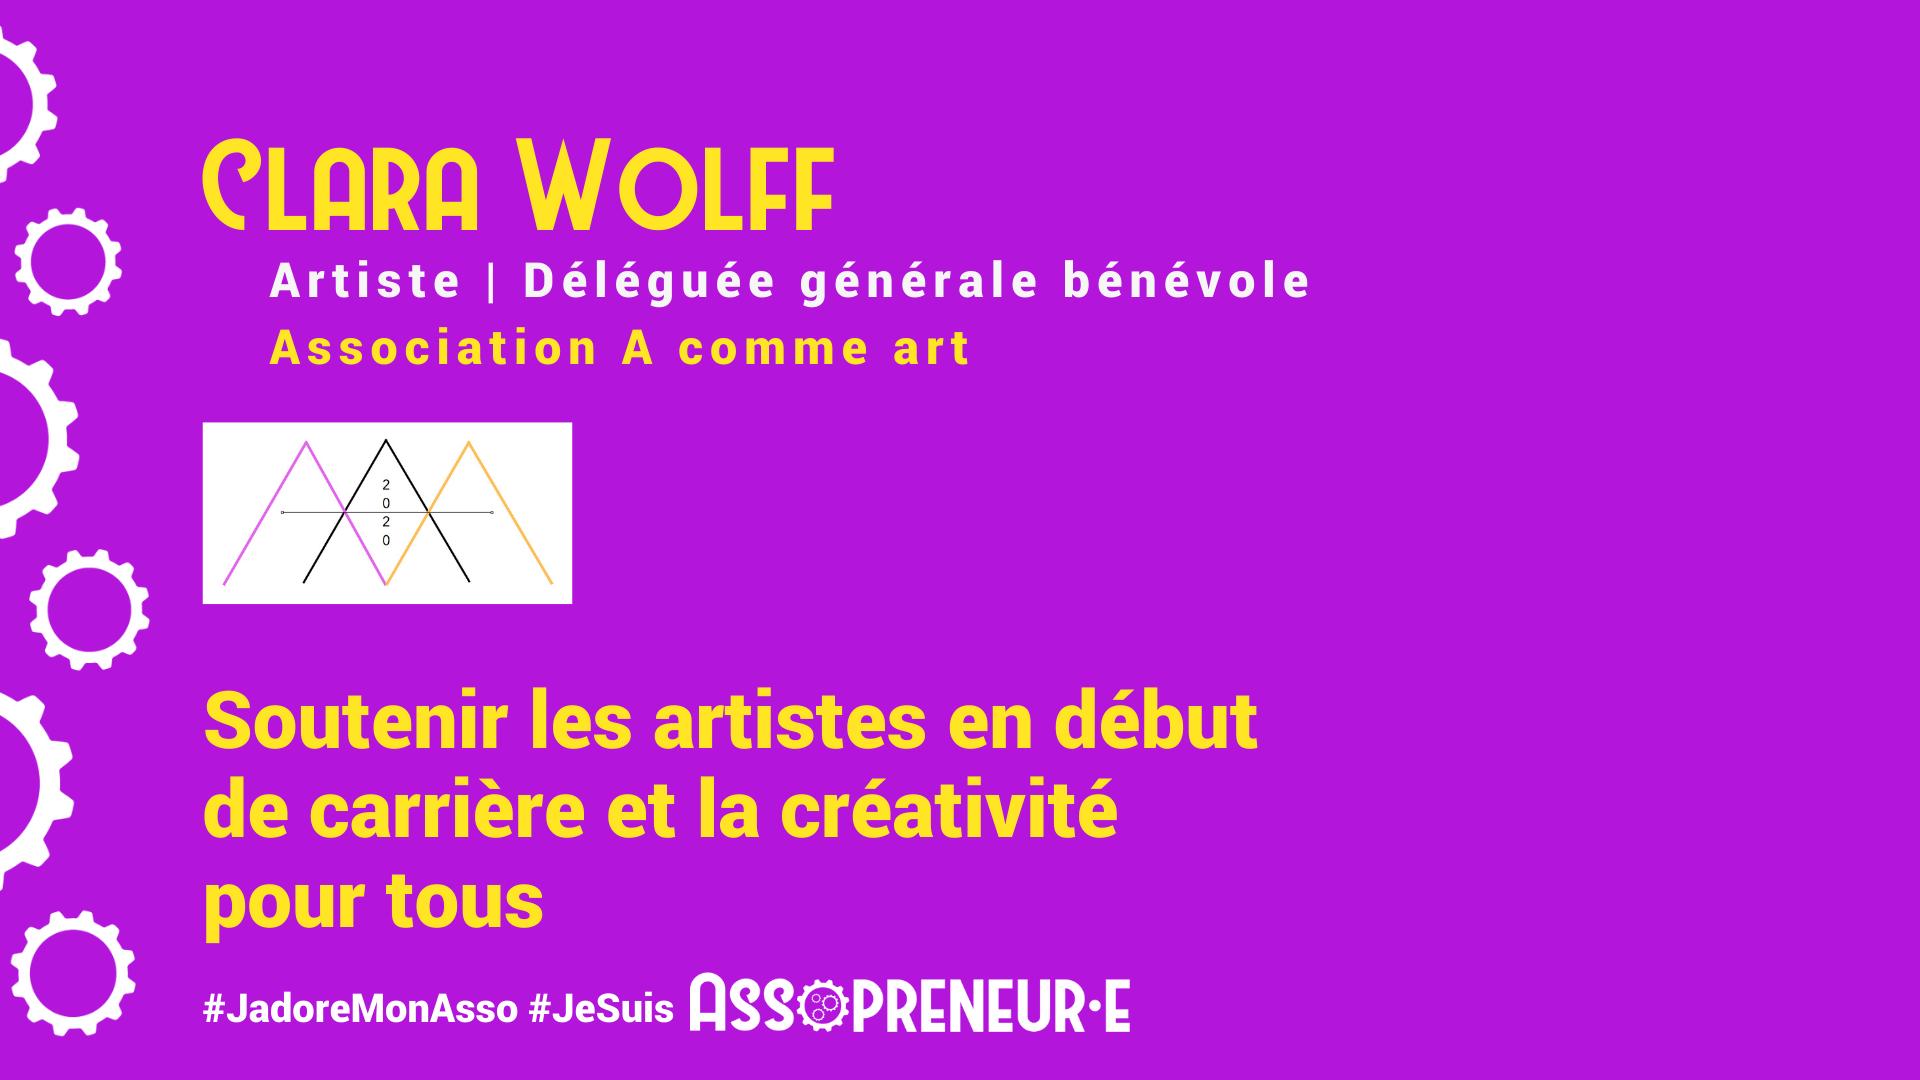 Clara Wolff membre programme Assopreneur